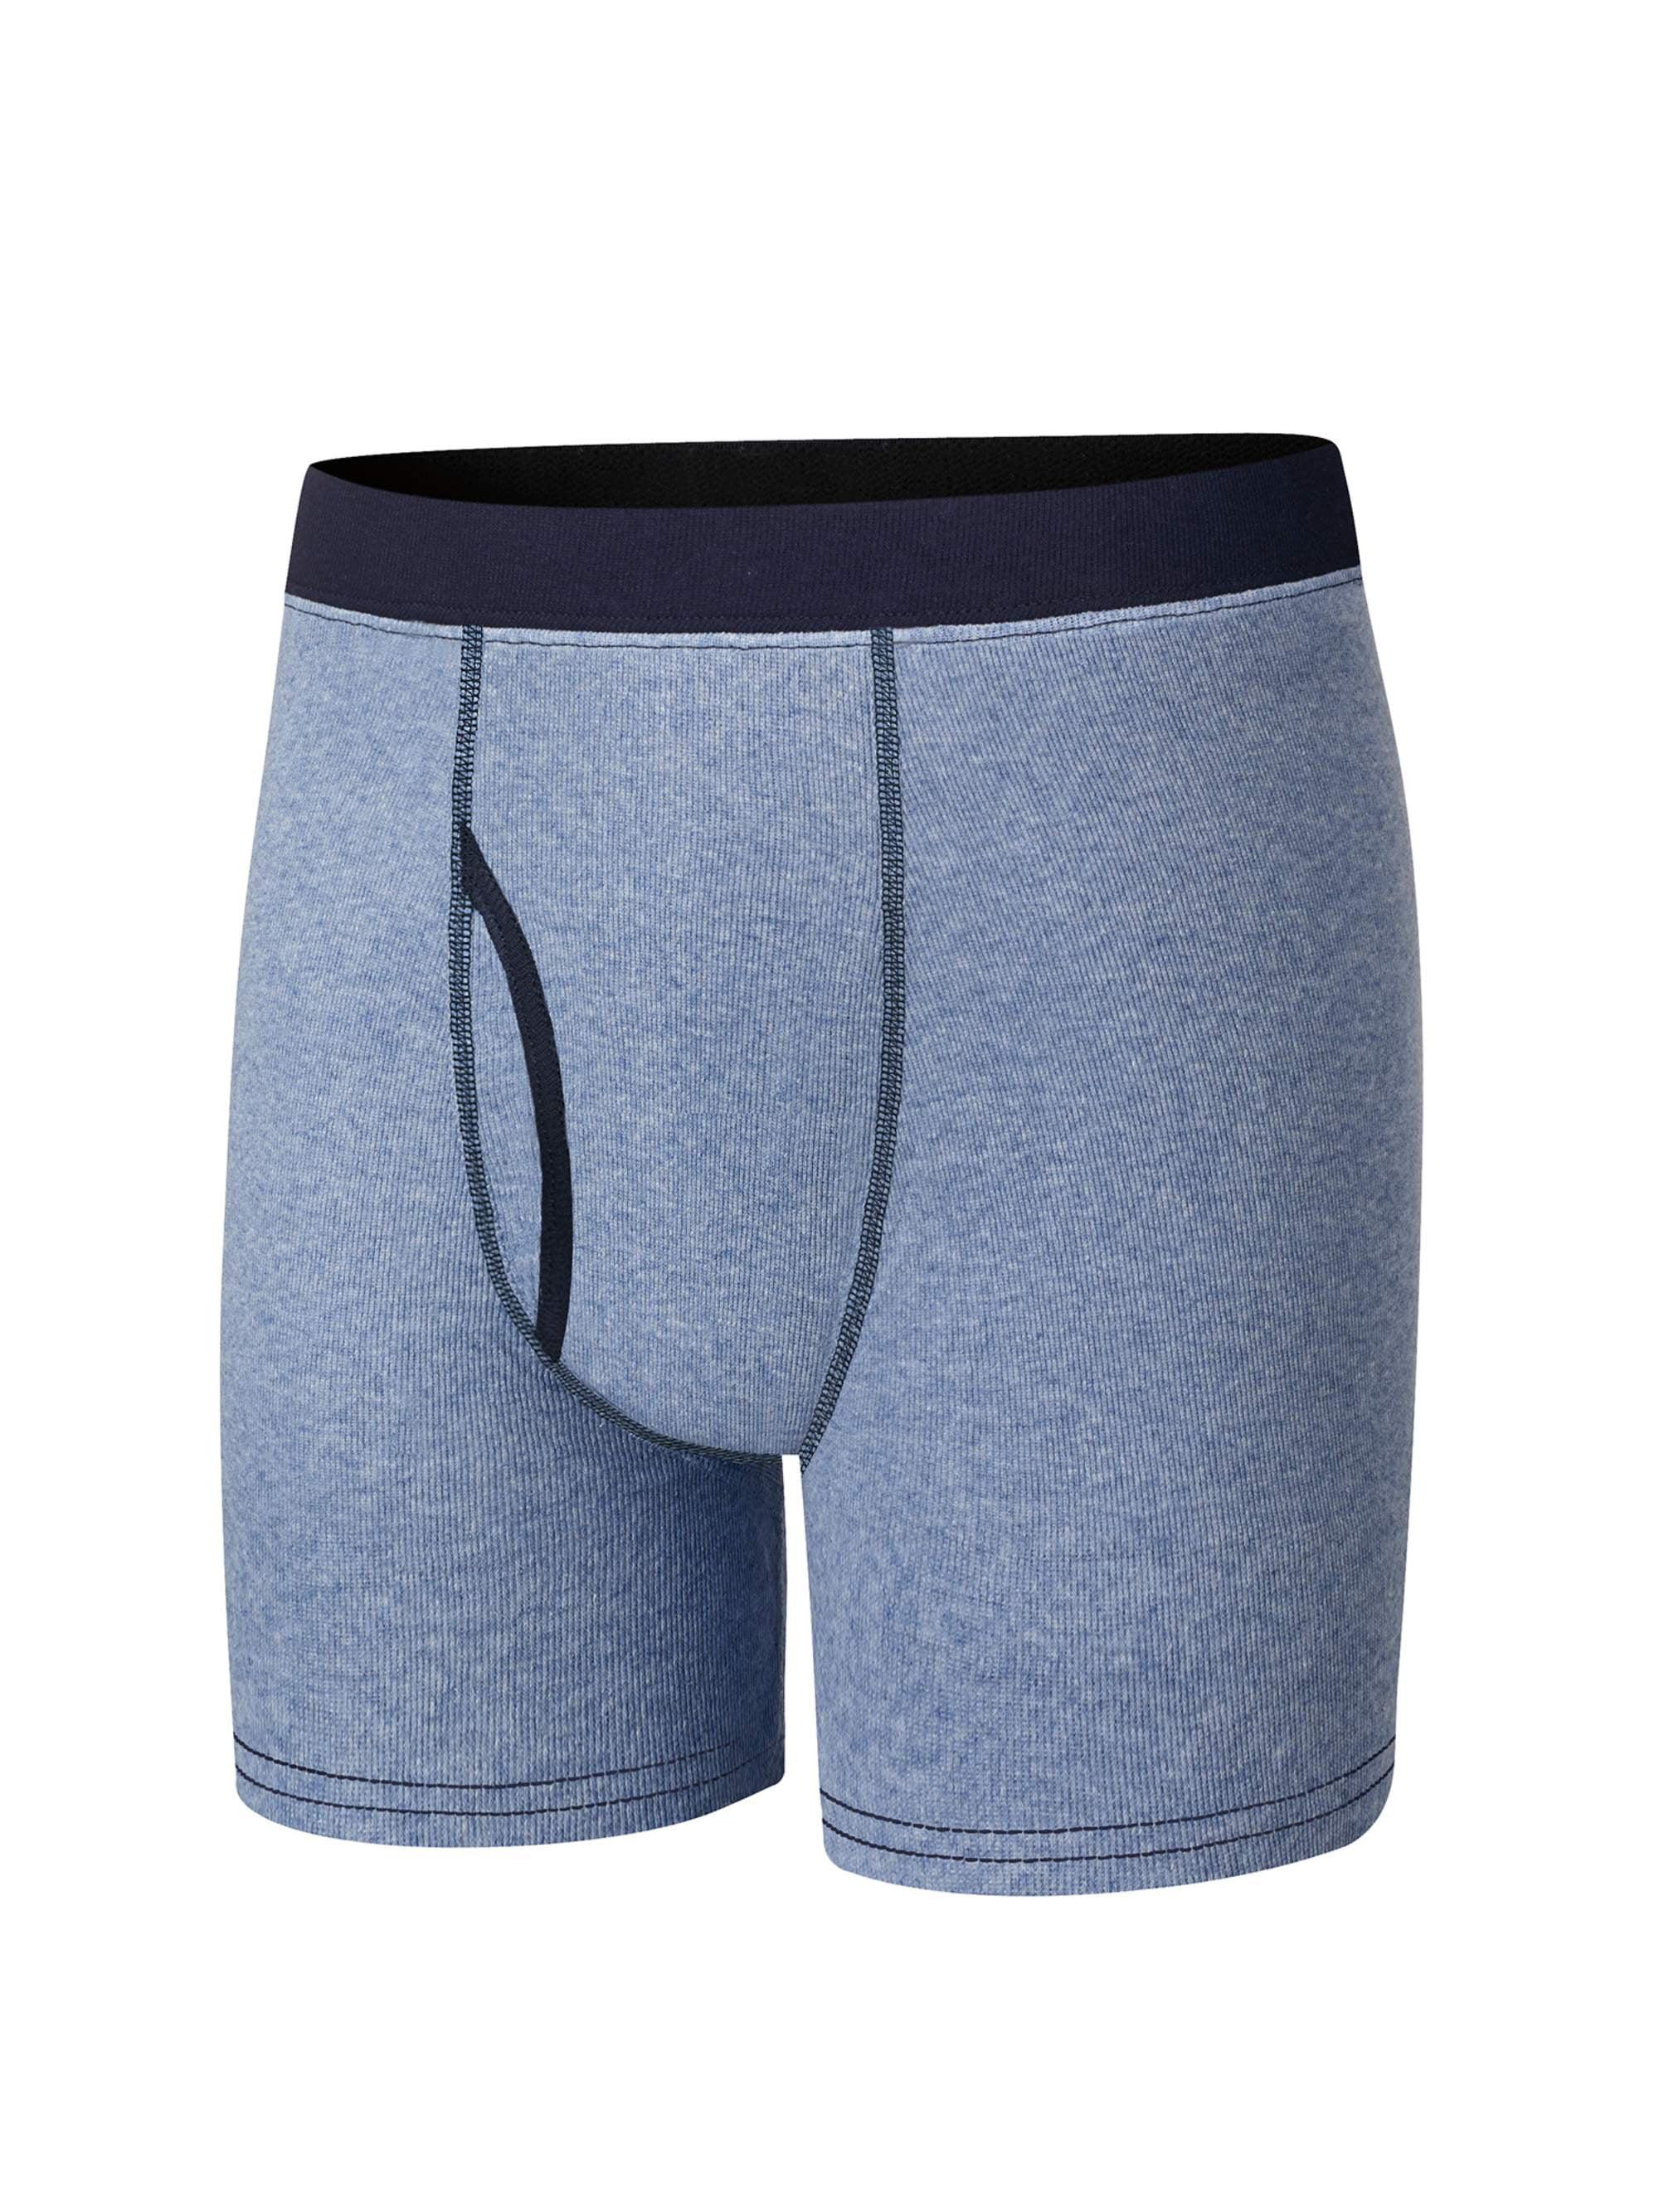 57852b96deb8 Boys' ComfortSoft Waistband Boxer Briefs 5-Pack – Walmart Inventory ...